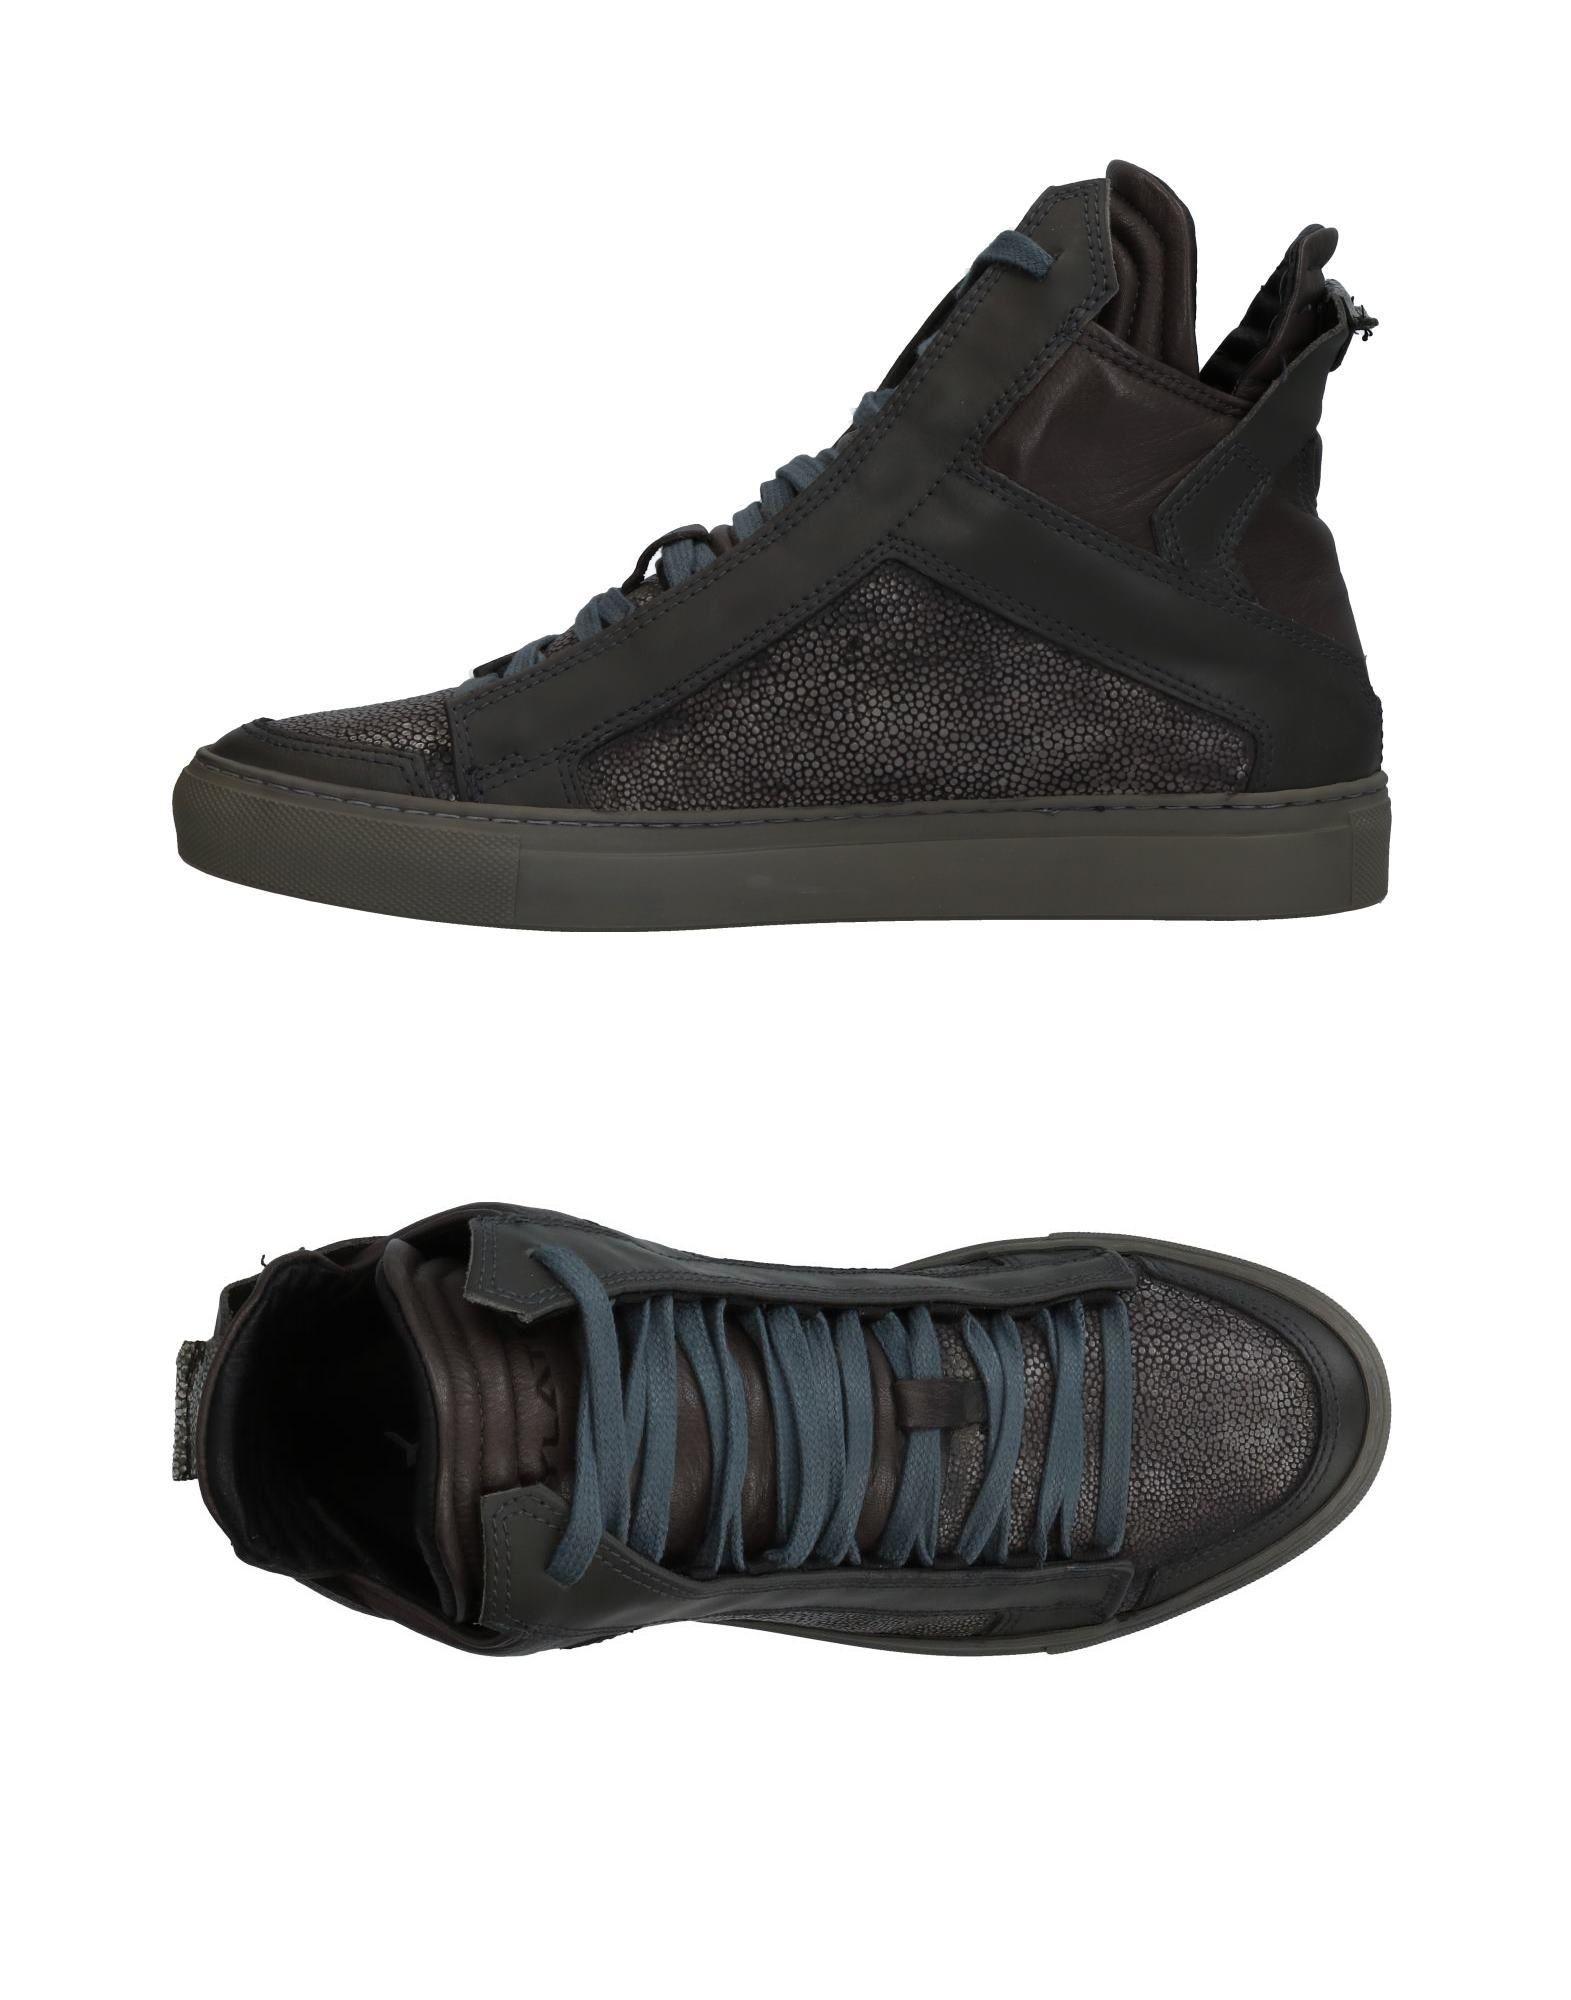 YLATI Высокие кеды и кроссовки кеды кроссовки высокие dc council mid tx stone camo